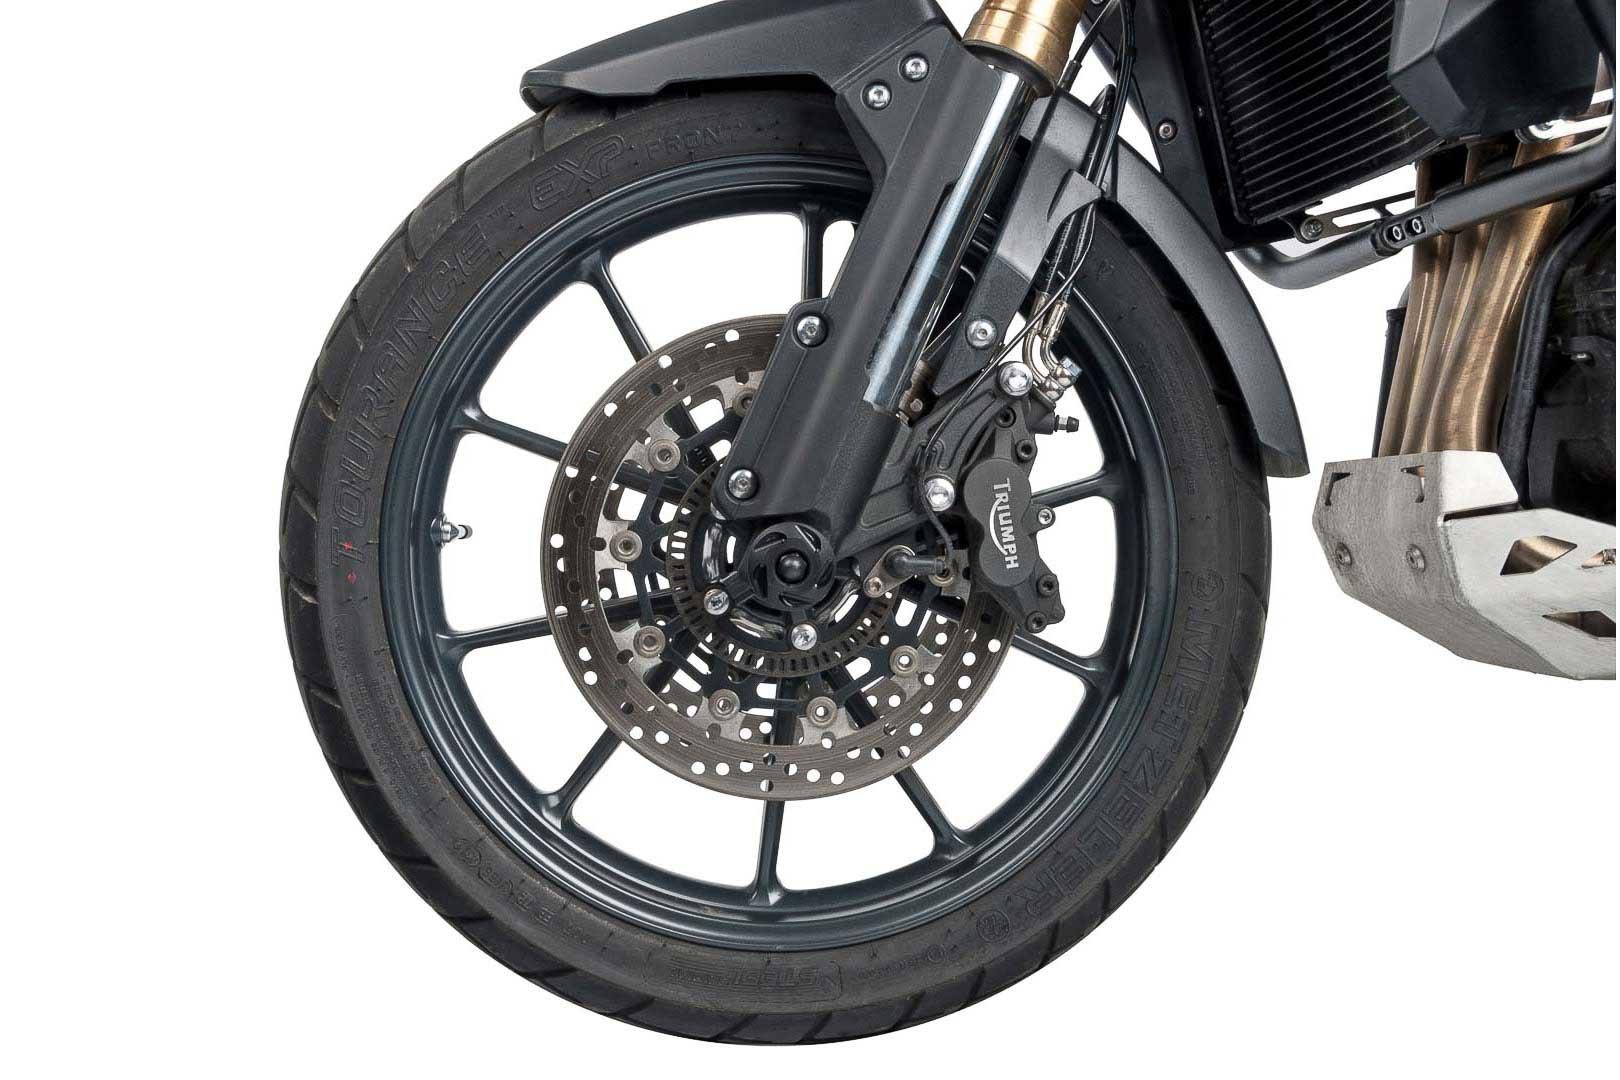 SW-Motech front axle sliders (black) Triumph, Honda, Yamaha